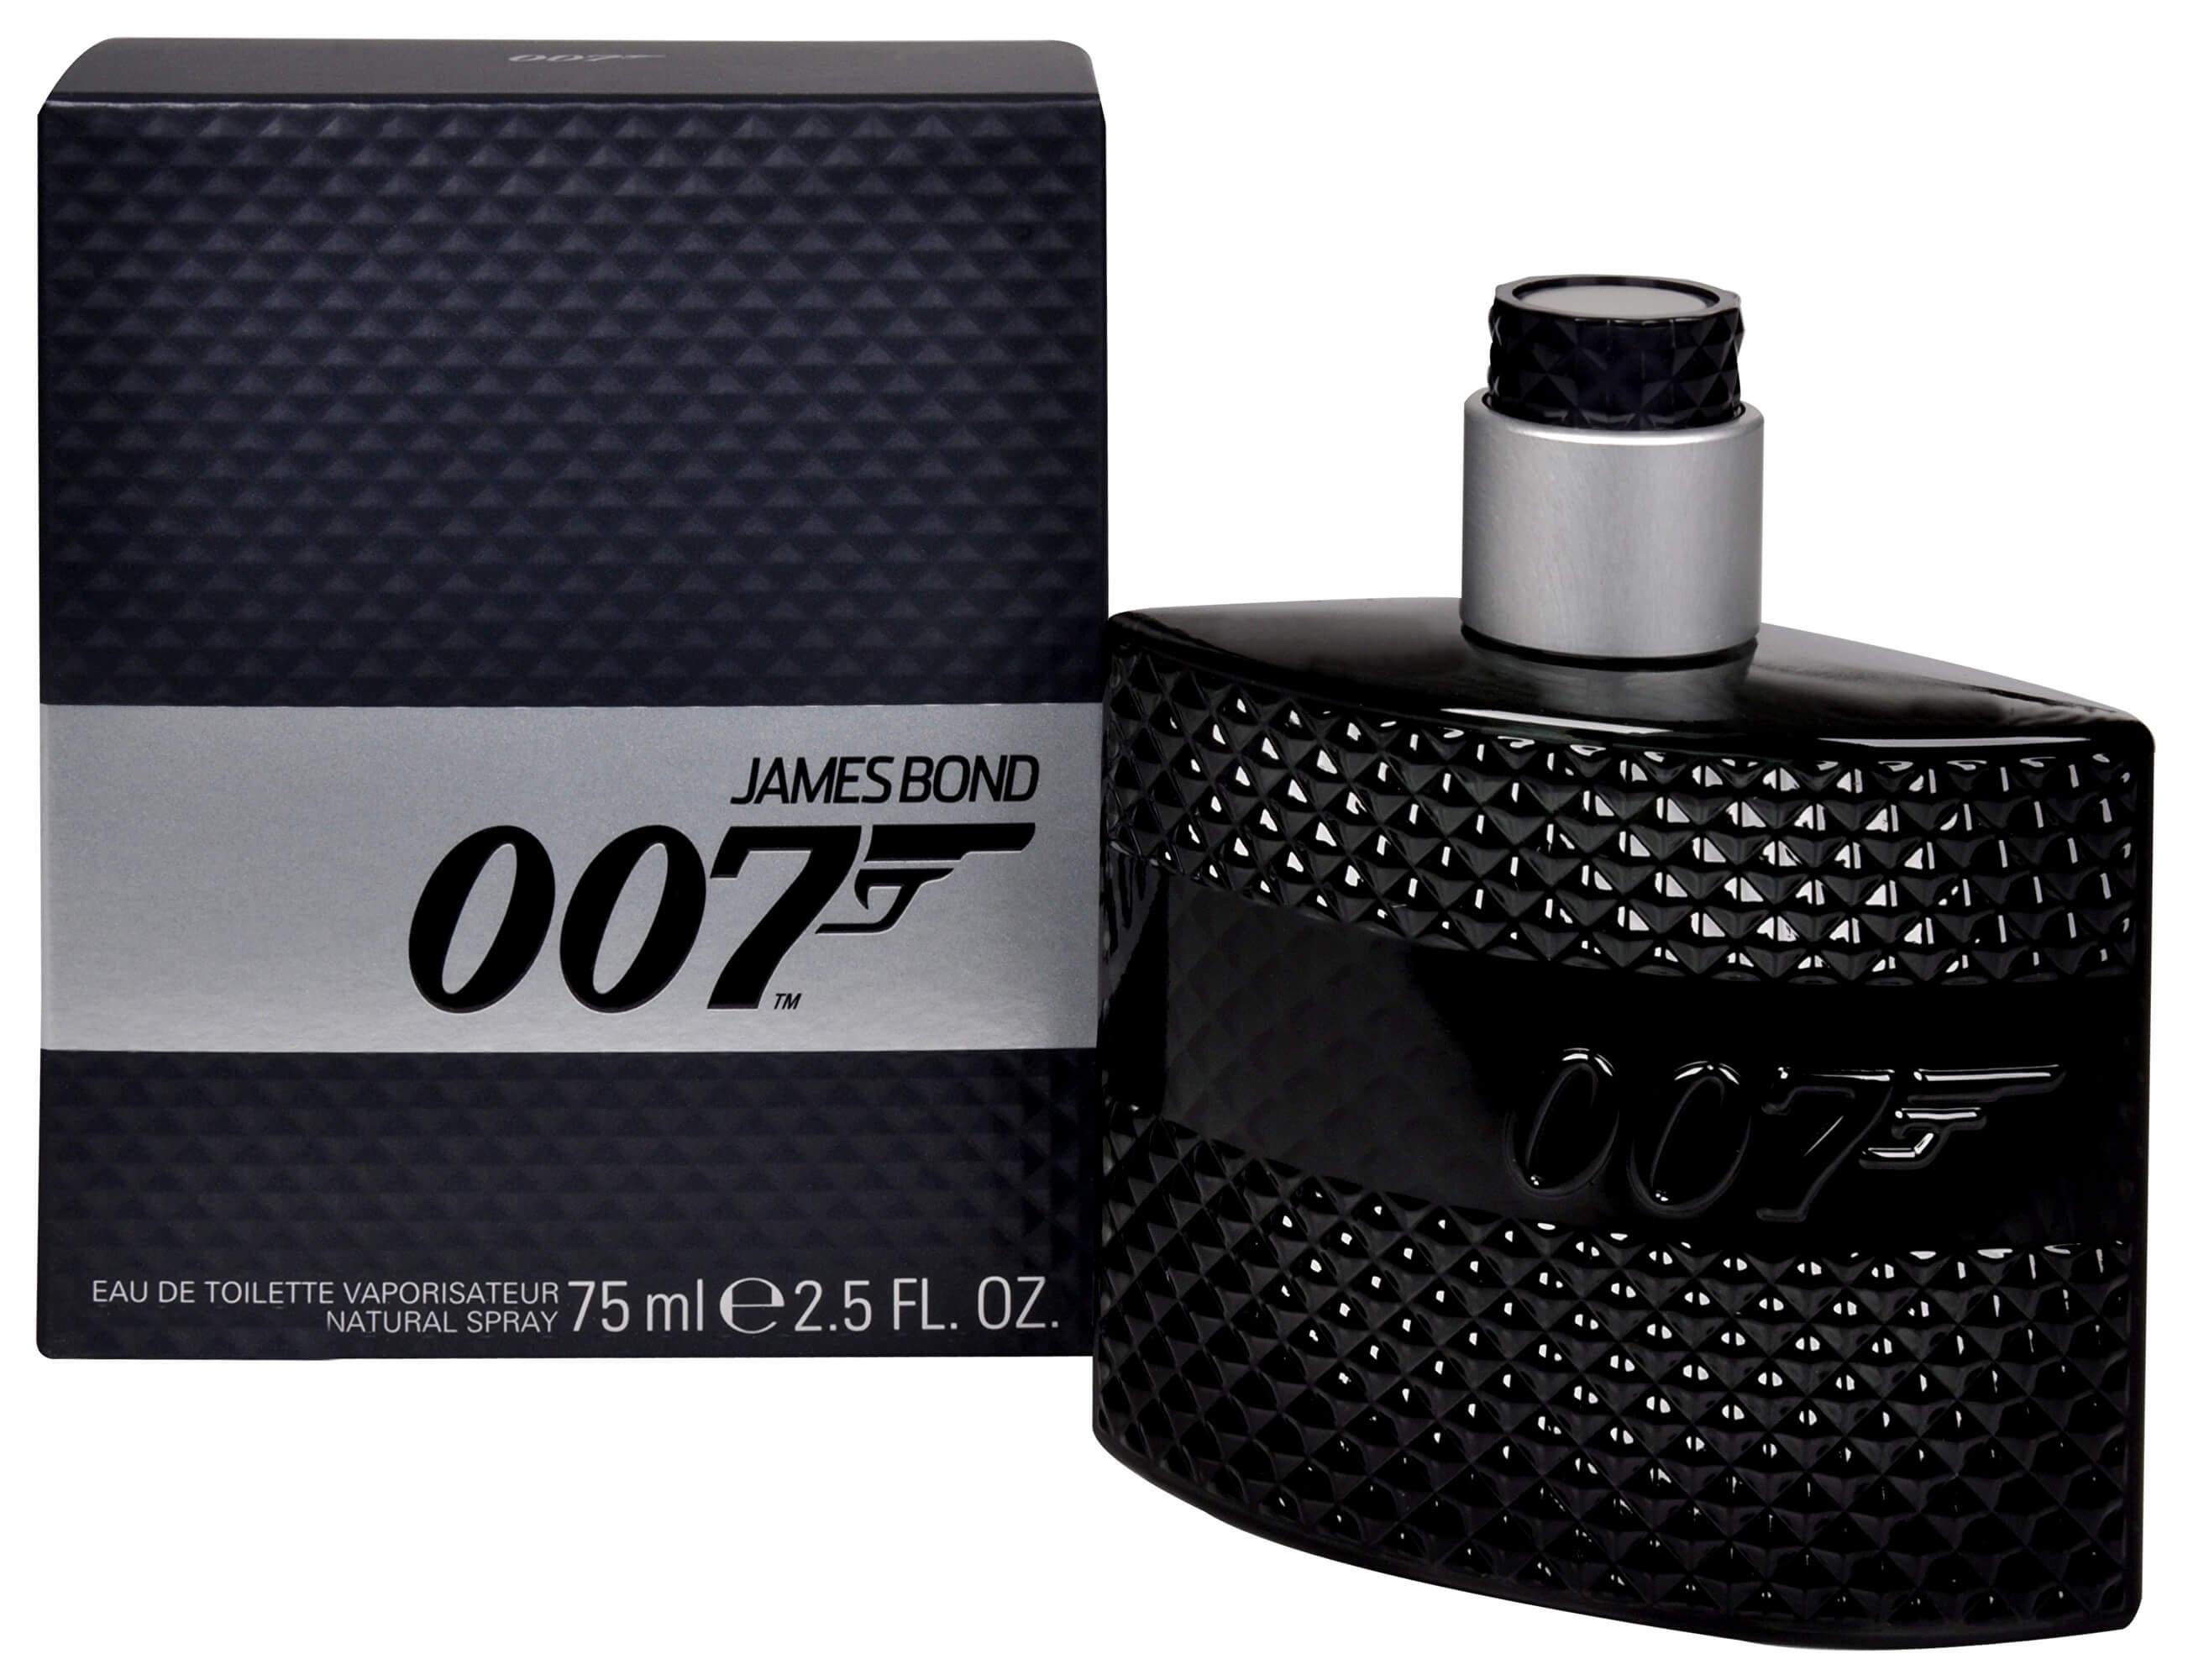 James Bond James Bond 007 - EDT30 ml